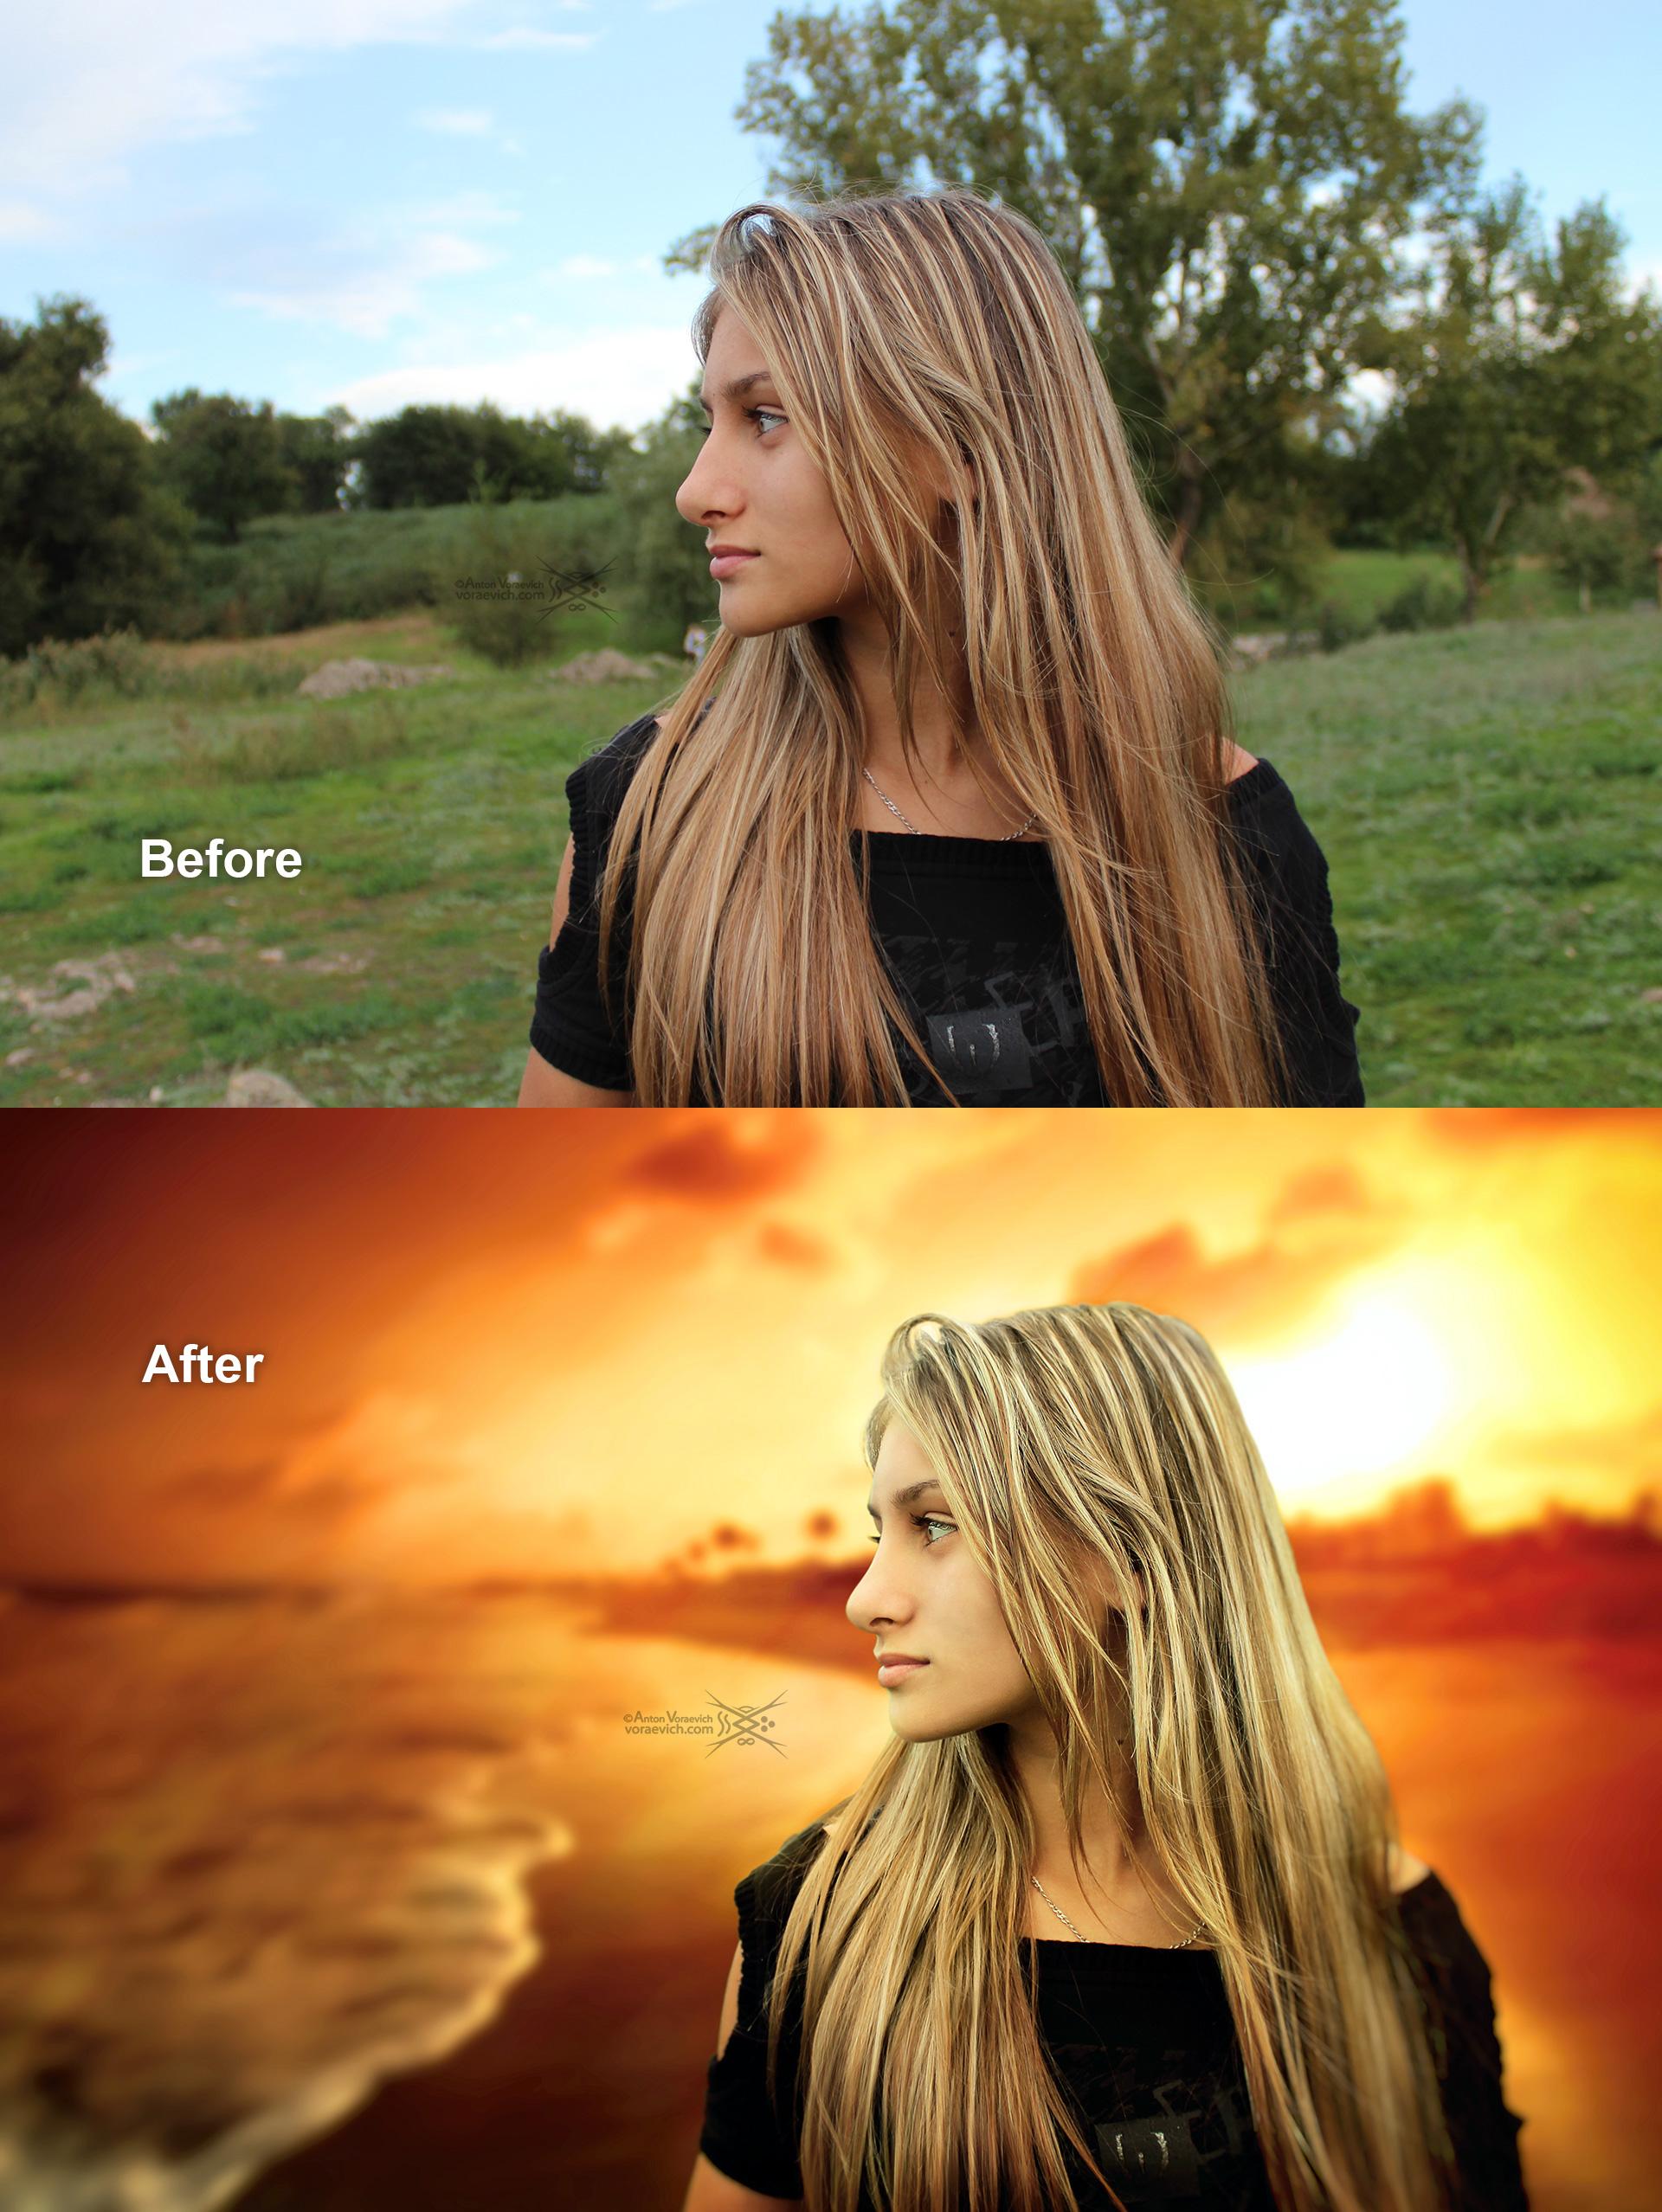 Portrait on sunset background